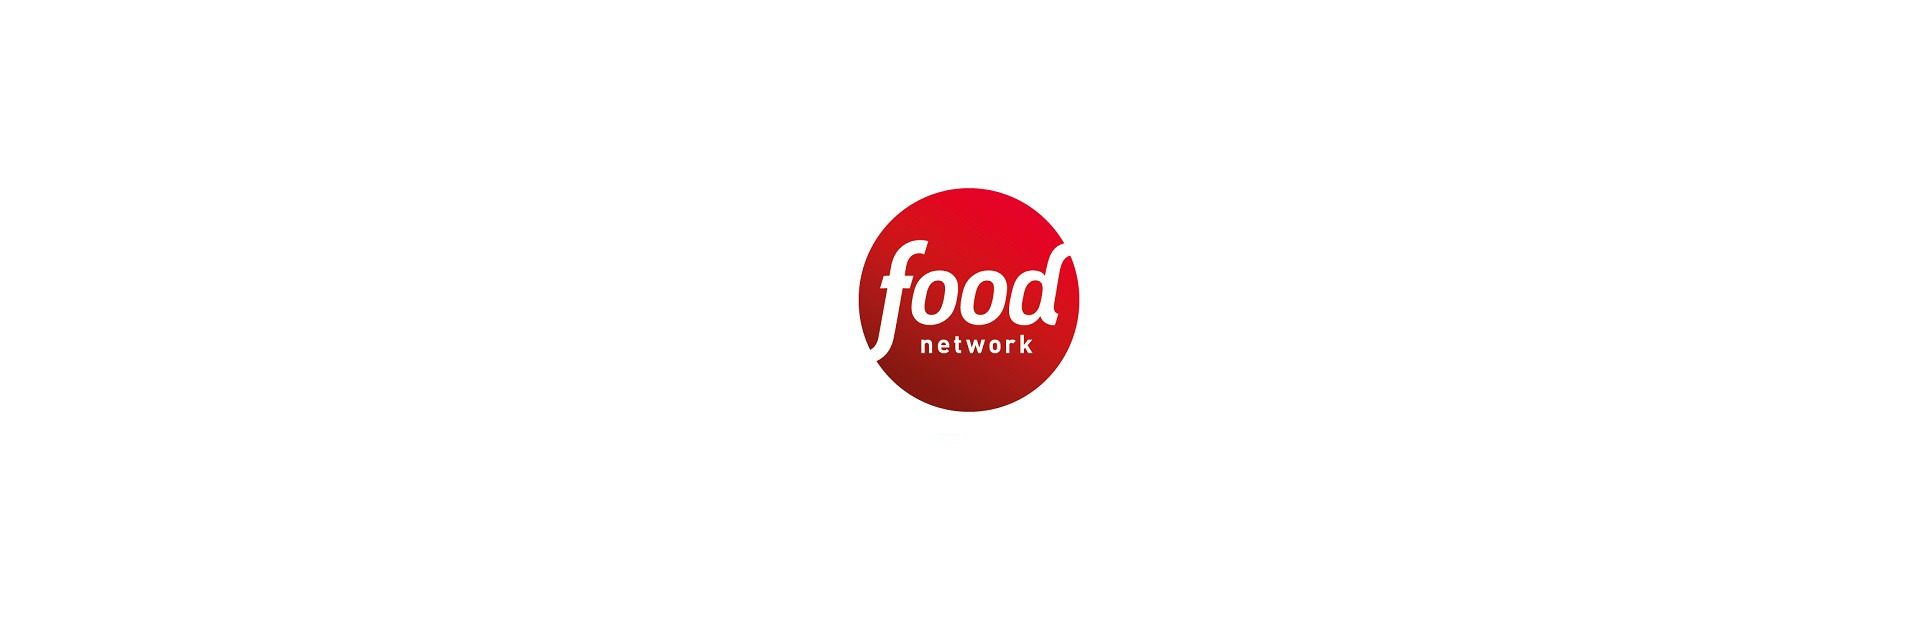 Ramówka Food Network